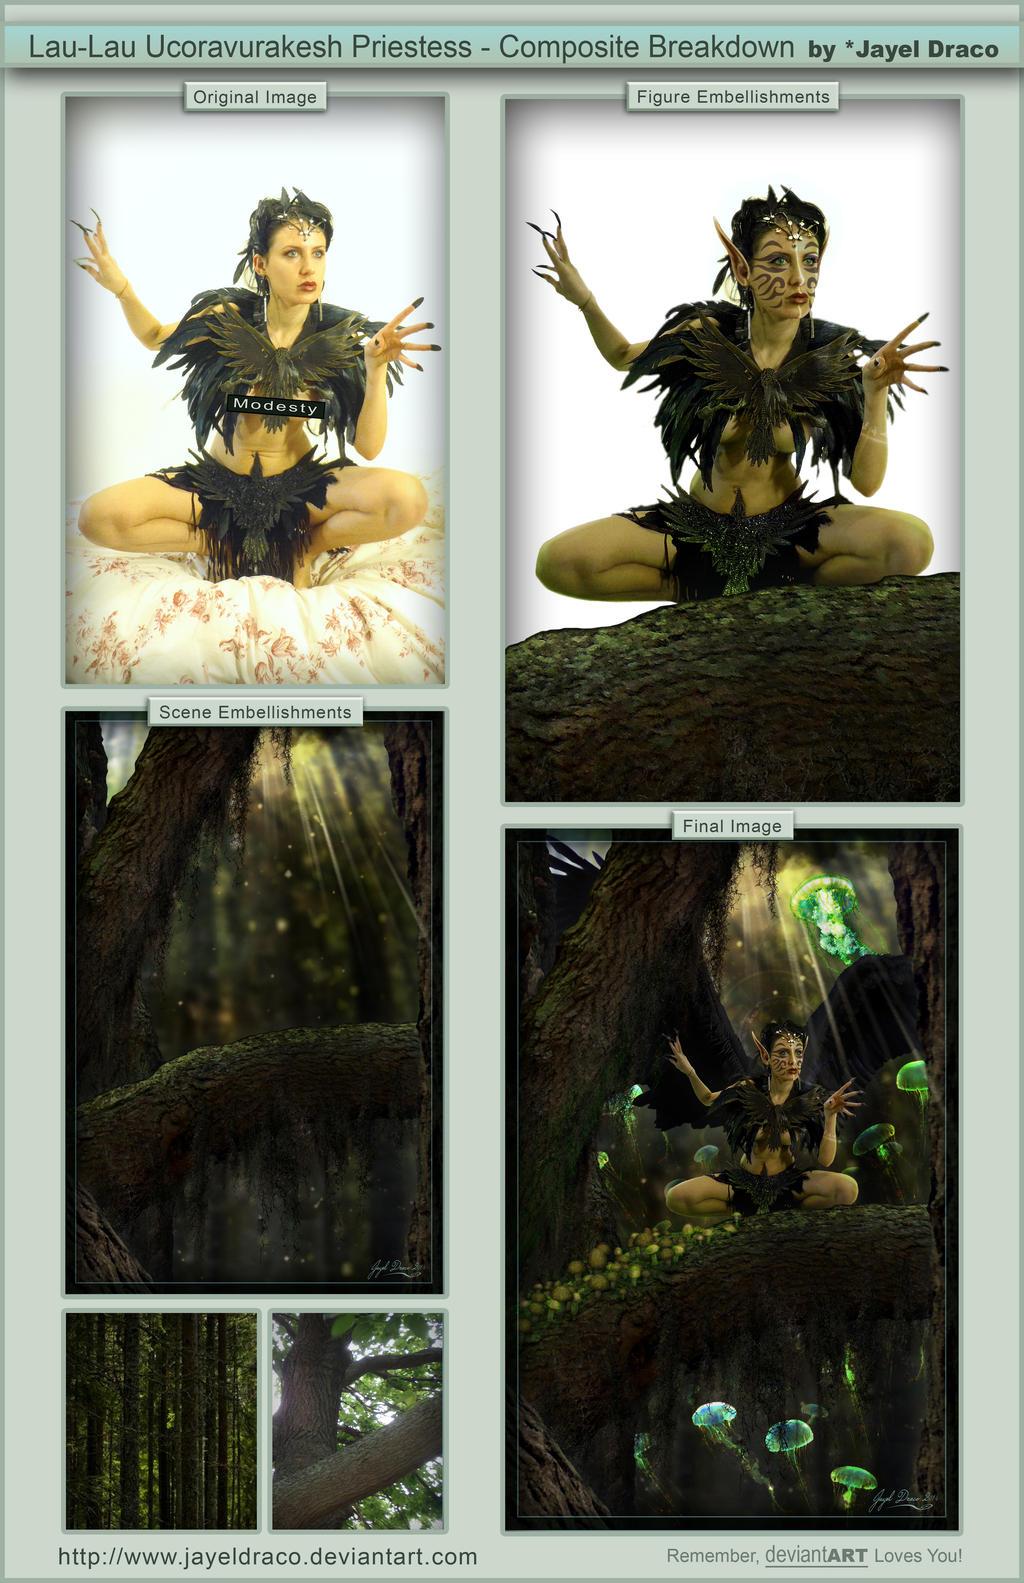 Lau-Lau Ucoravurakesh Priestess - Break Down